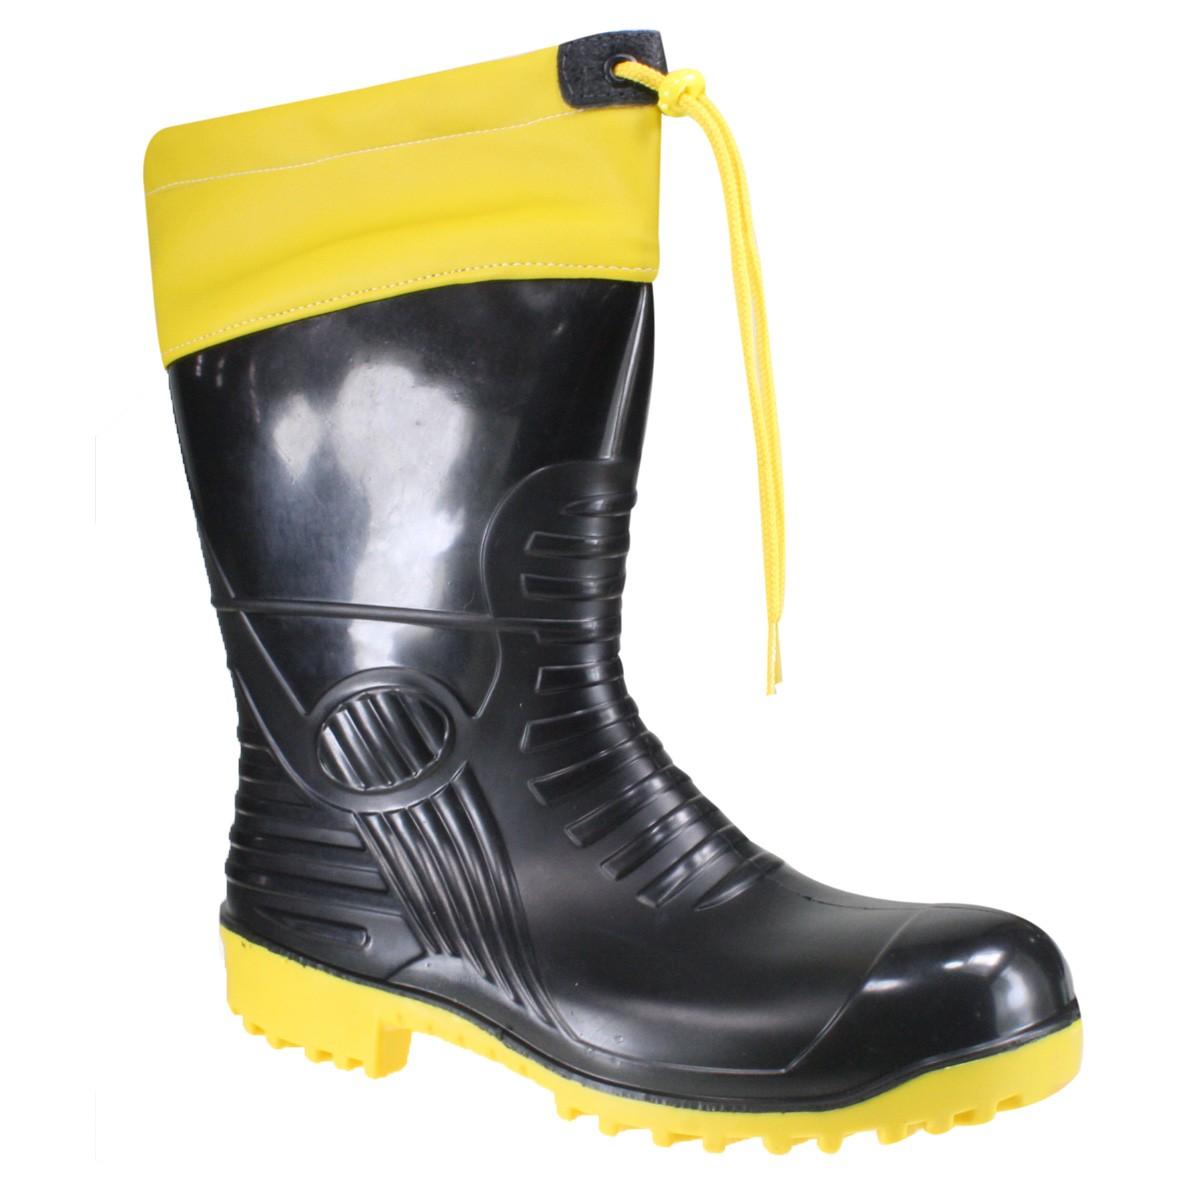 31c67f62cc5 Bota Borracha Patrol 61128 Preto Amarelo